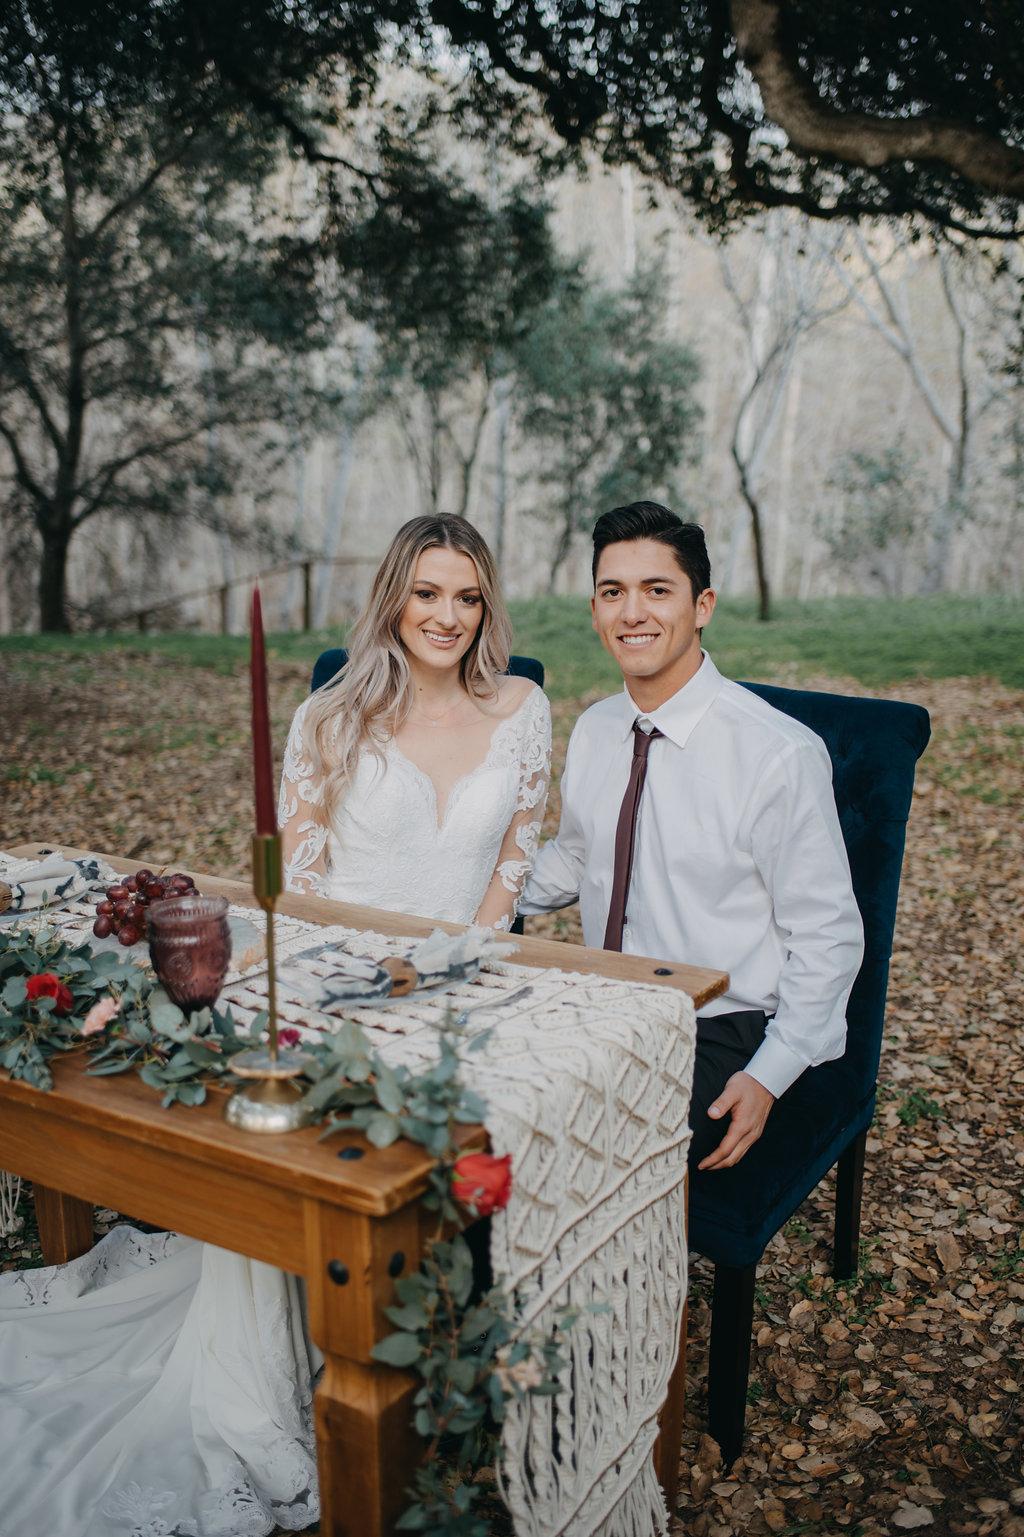 regal fall winter holiday wedding colors trend boho wedding dress under $1000